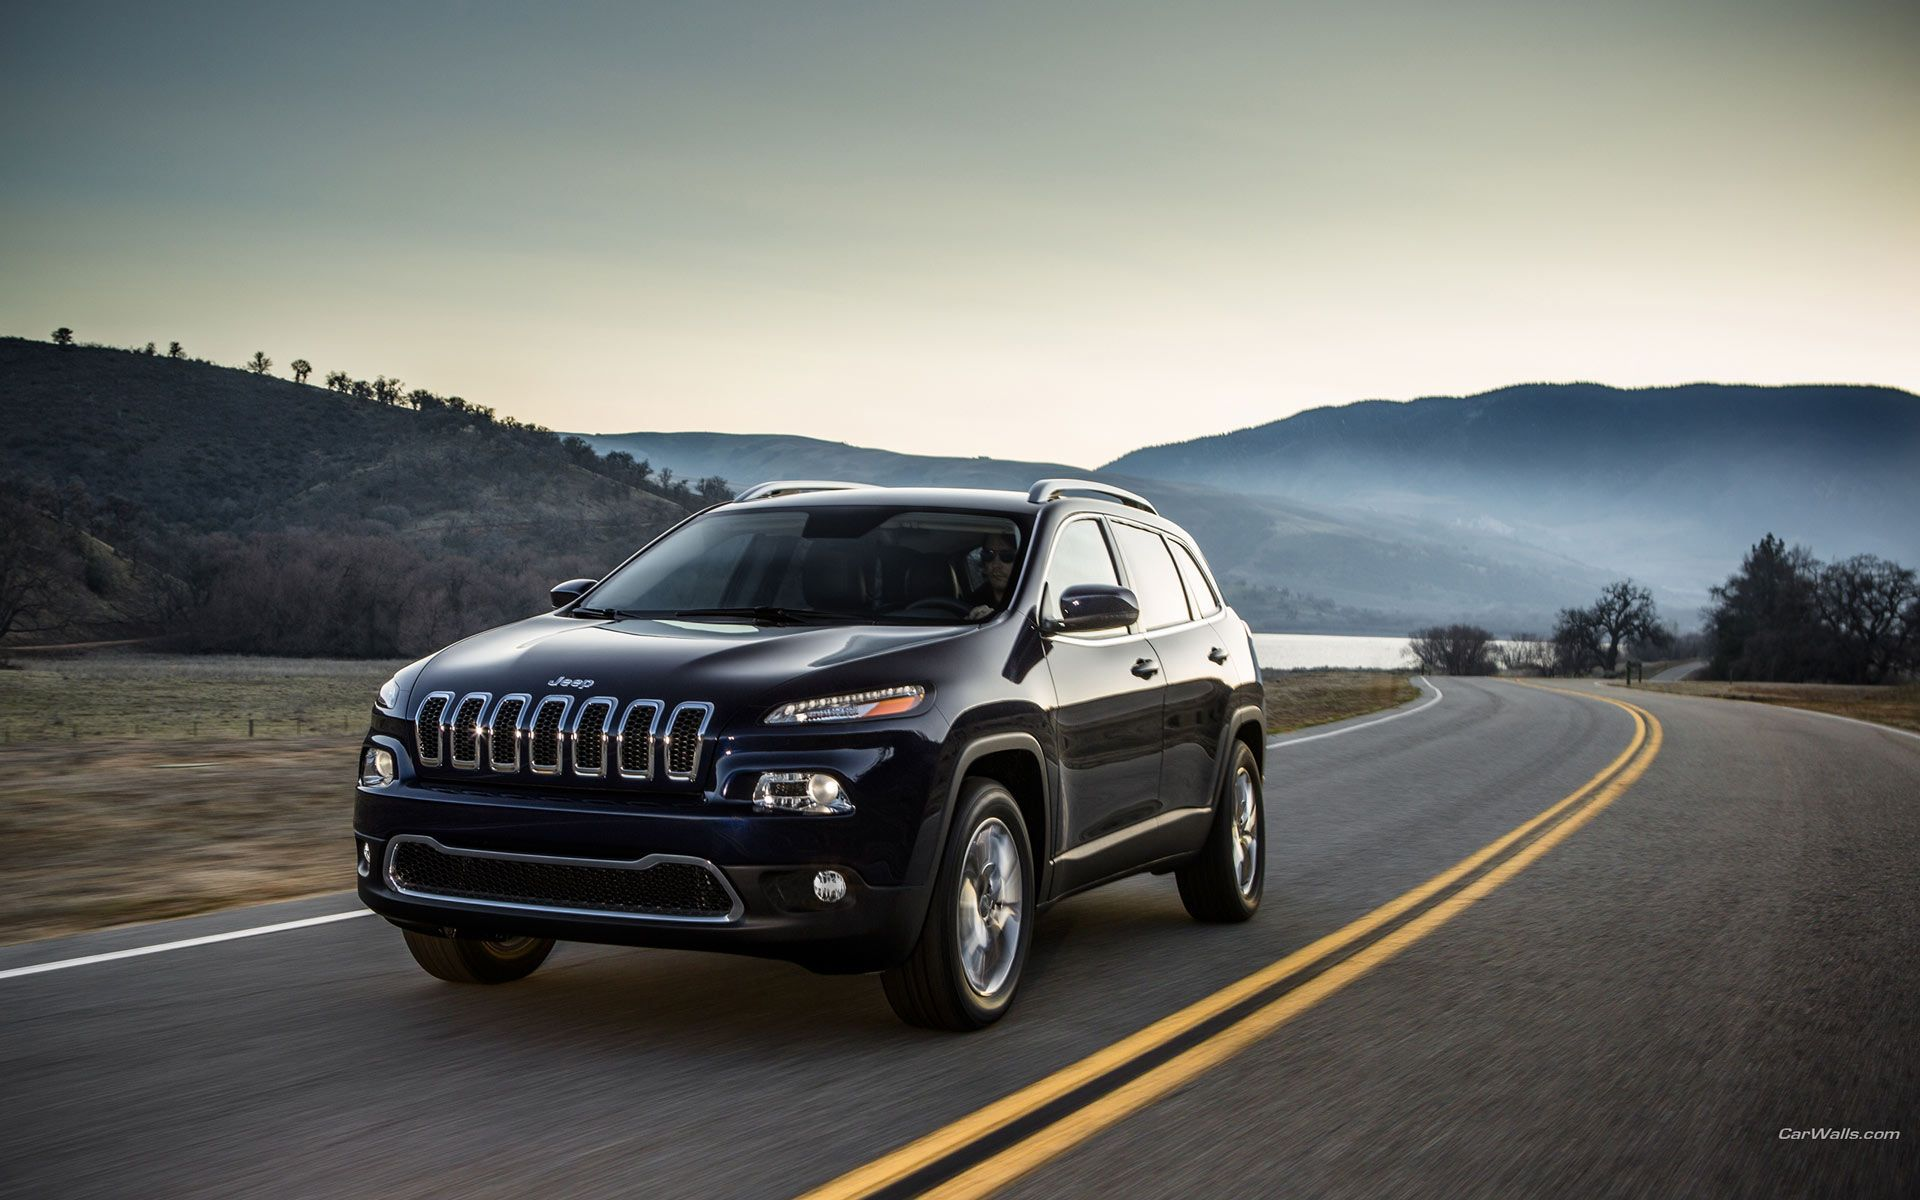 Jeep Cherokee Jeep cherokee, New jeep cherokee, Jeep